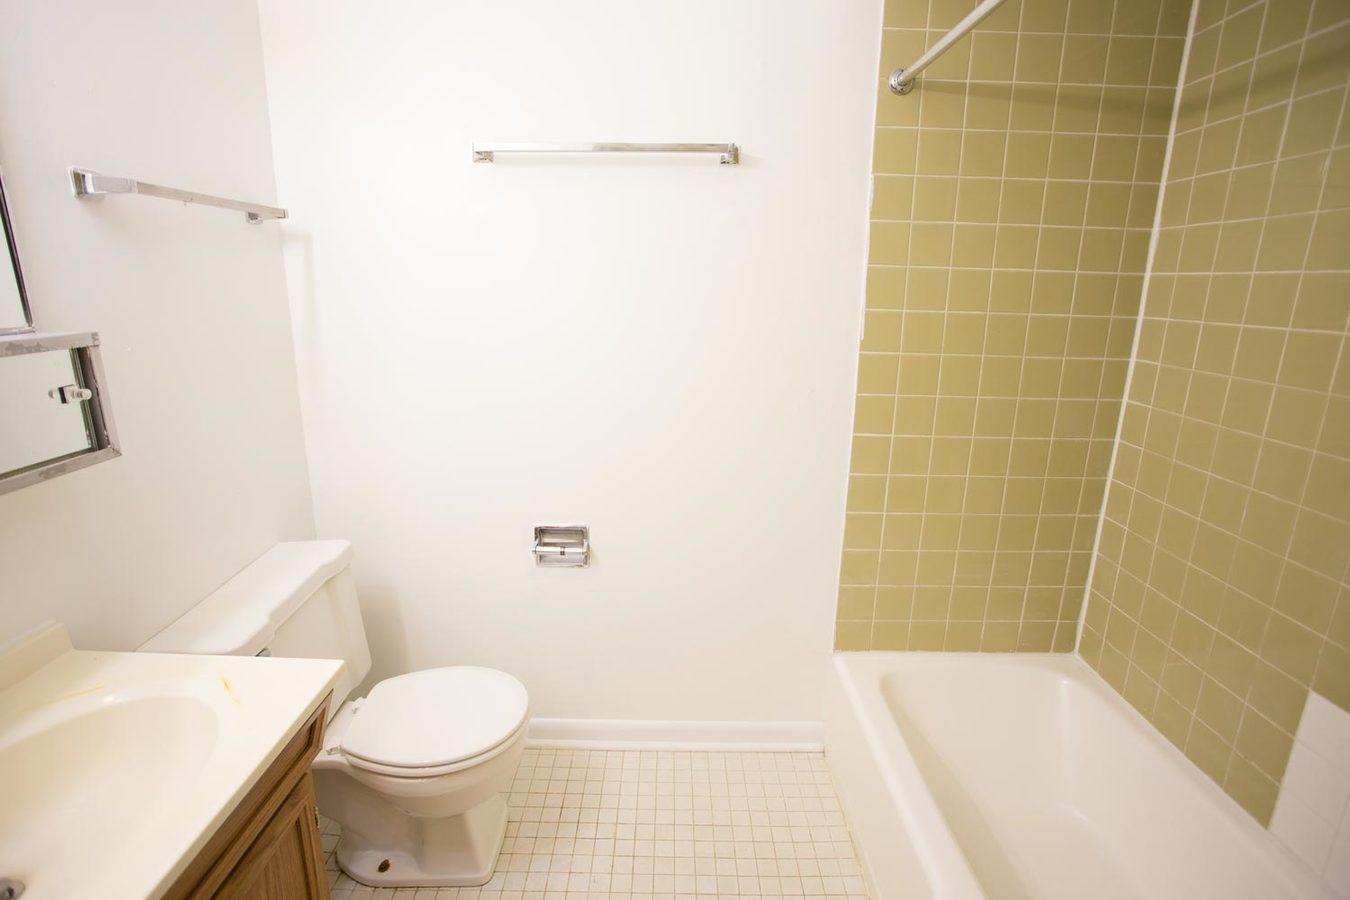 Studio 1 Bathroom Apartment for rent at Cornell Terrace in Chicago, IL